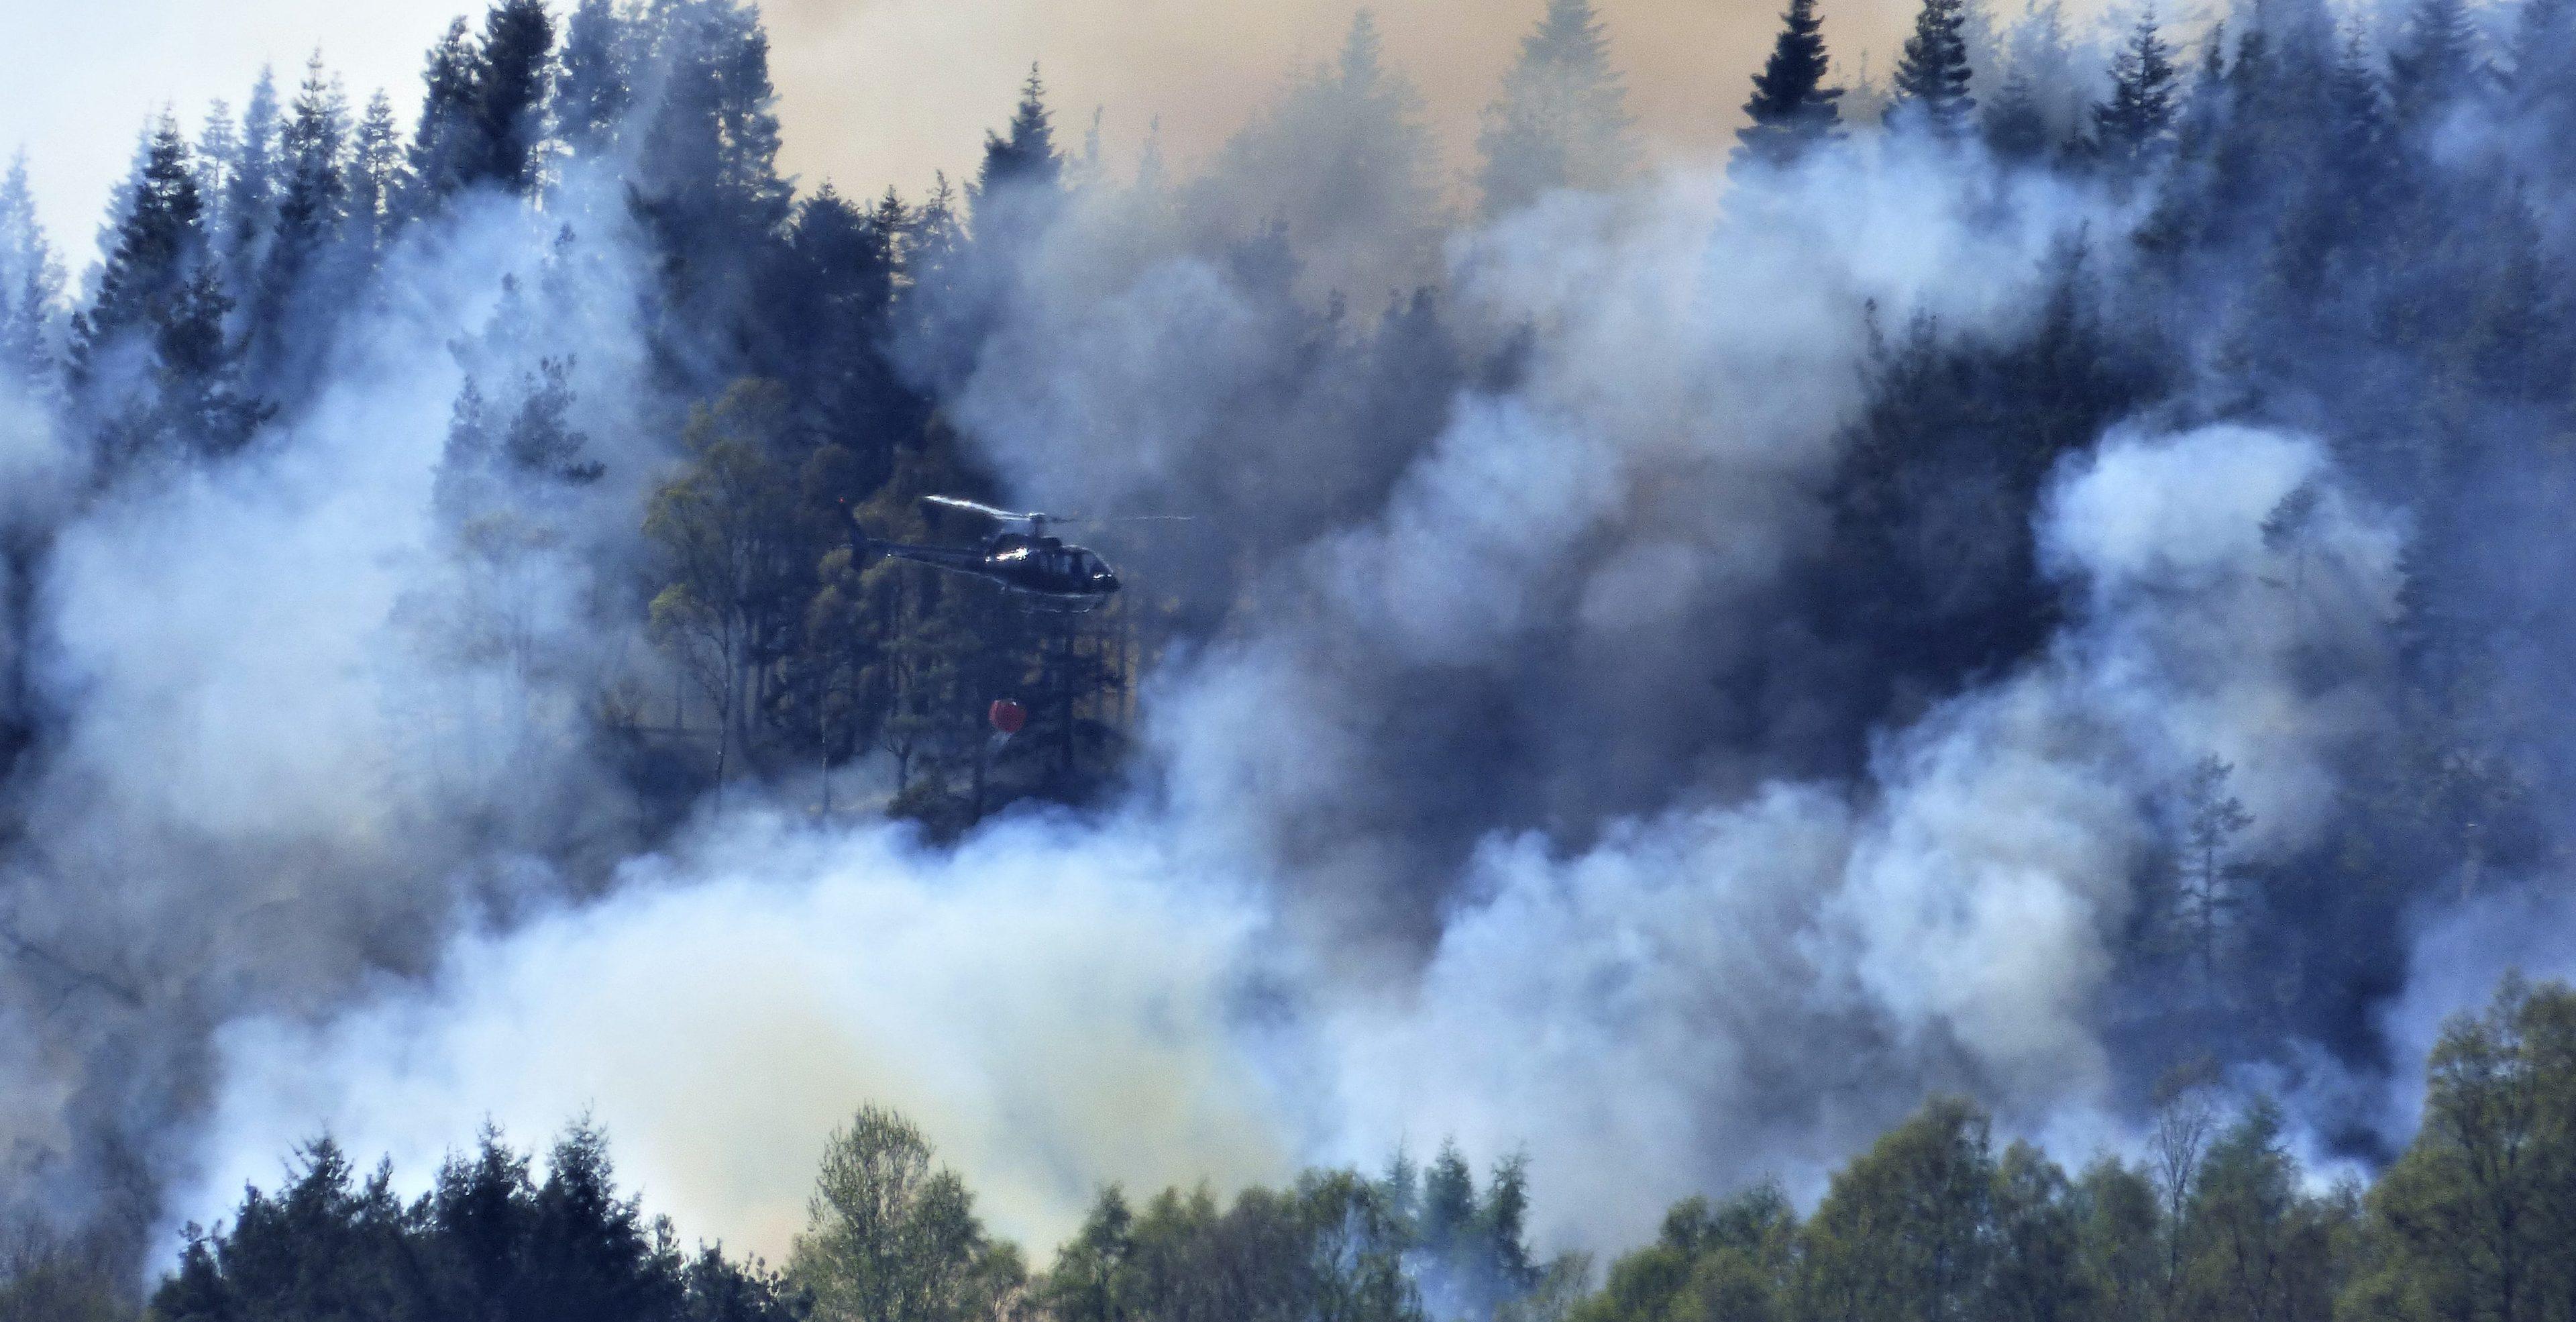 The incident follows a serious blaze at Faskally.